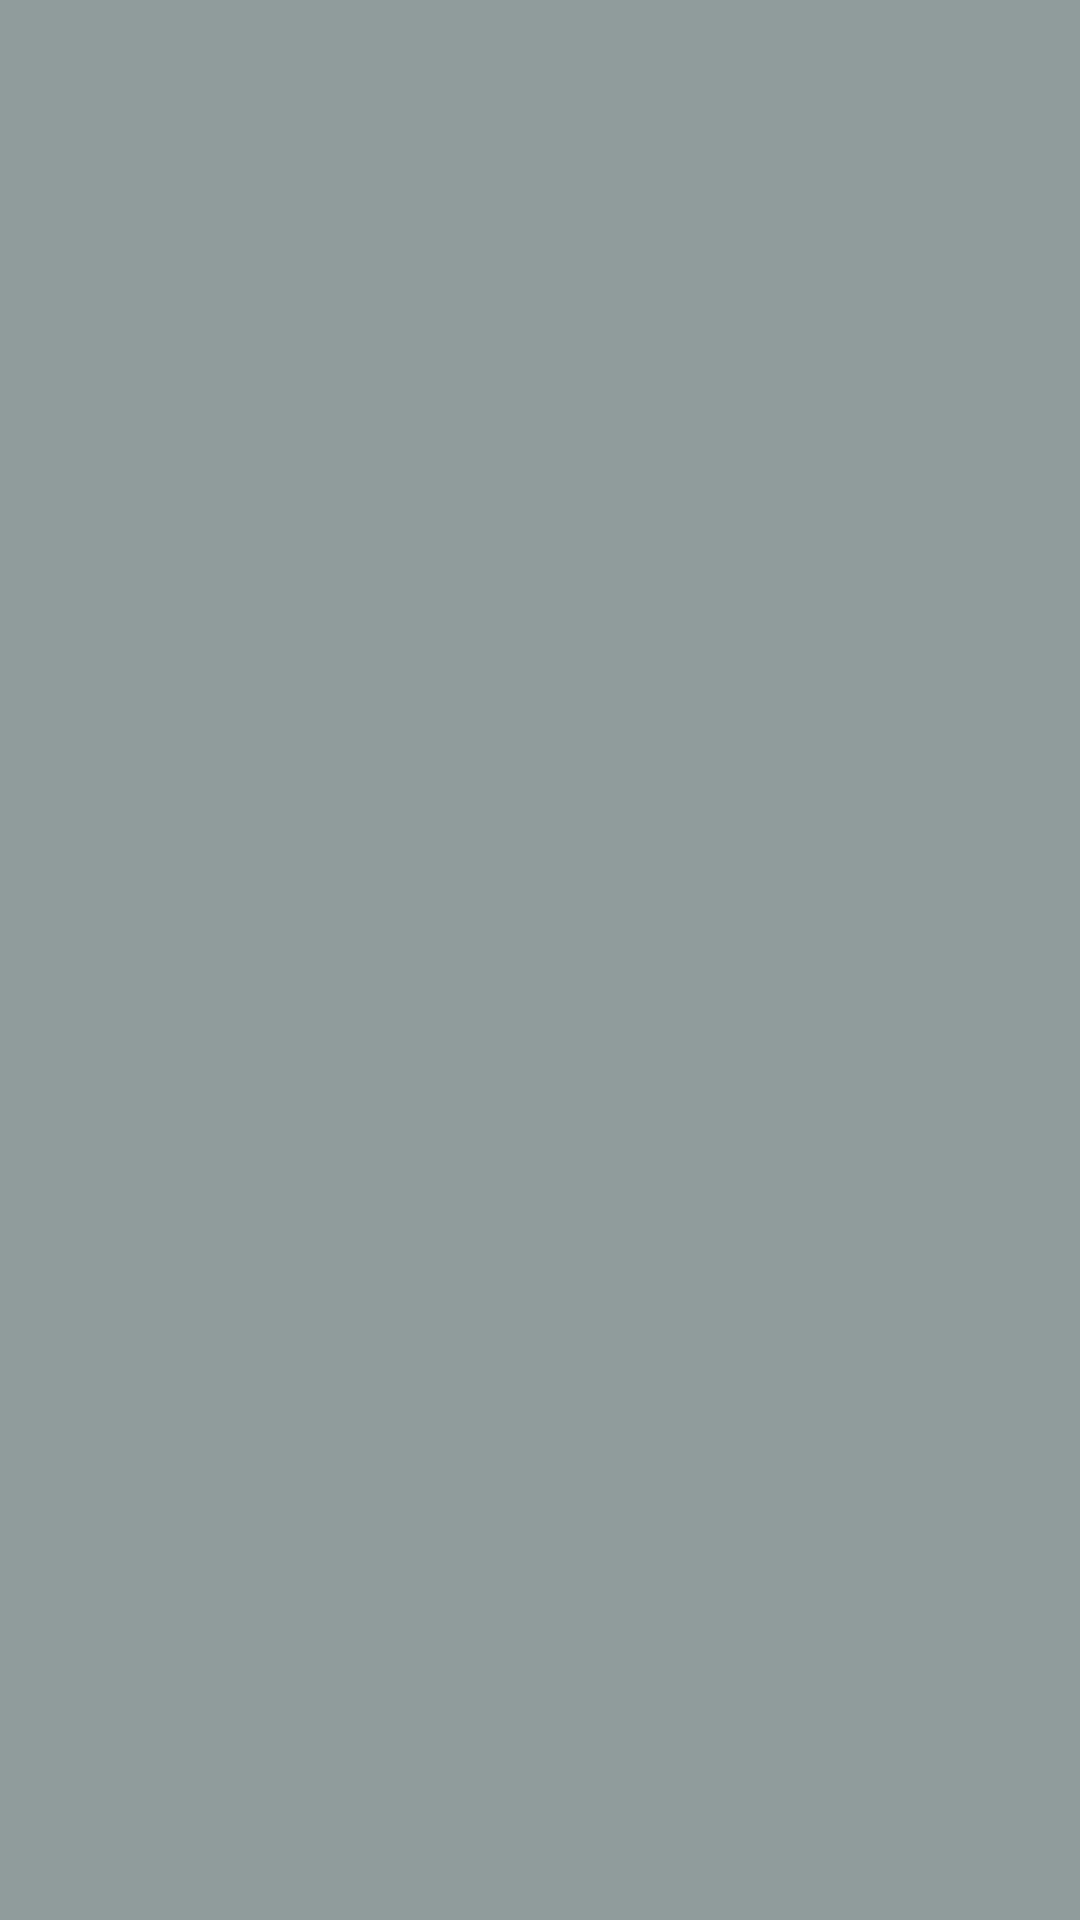 Res: 1080x1920, Visit The Home Depot to buy BEHR Premium Plus Ultra Brampton Gray Flat  Enamel Interior Paint 175401